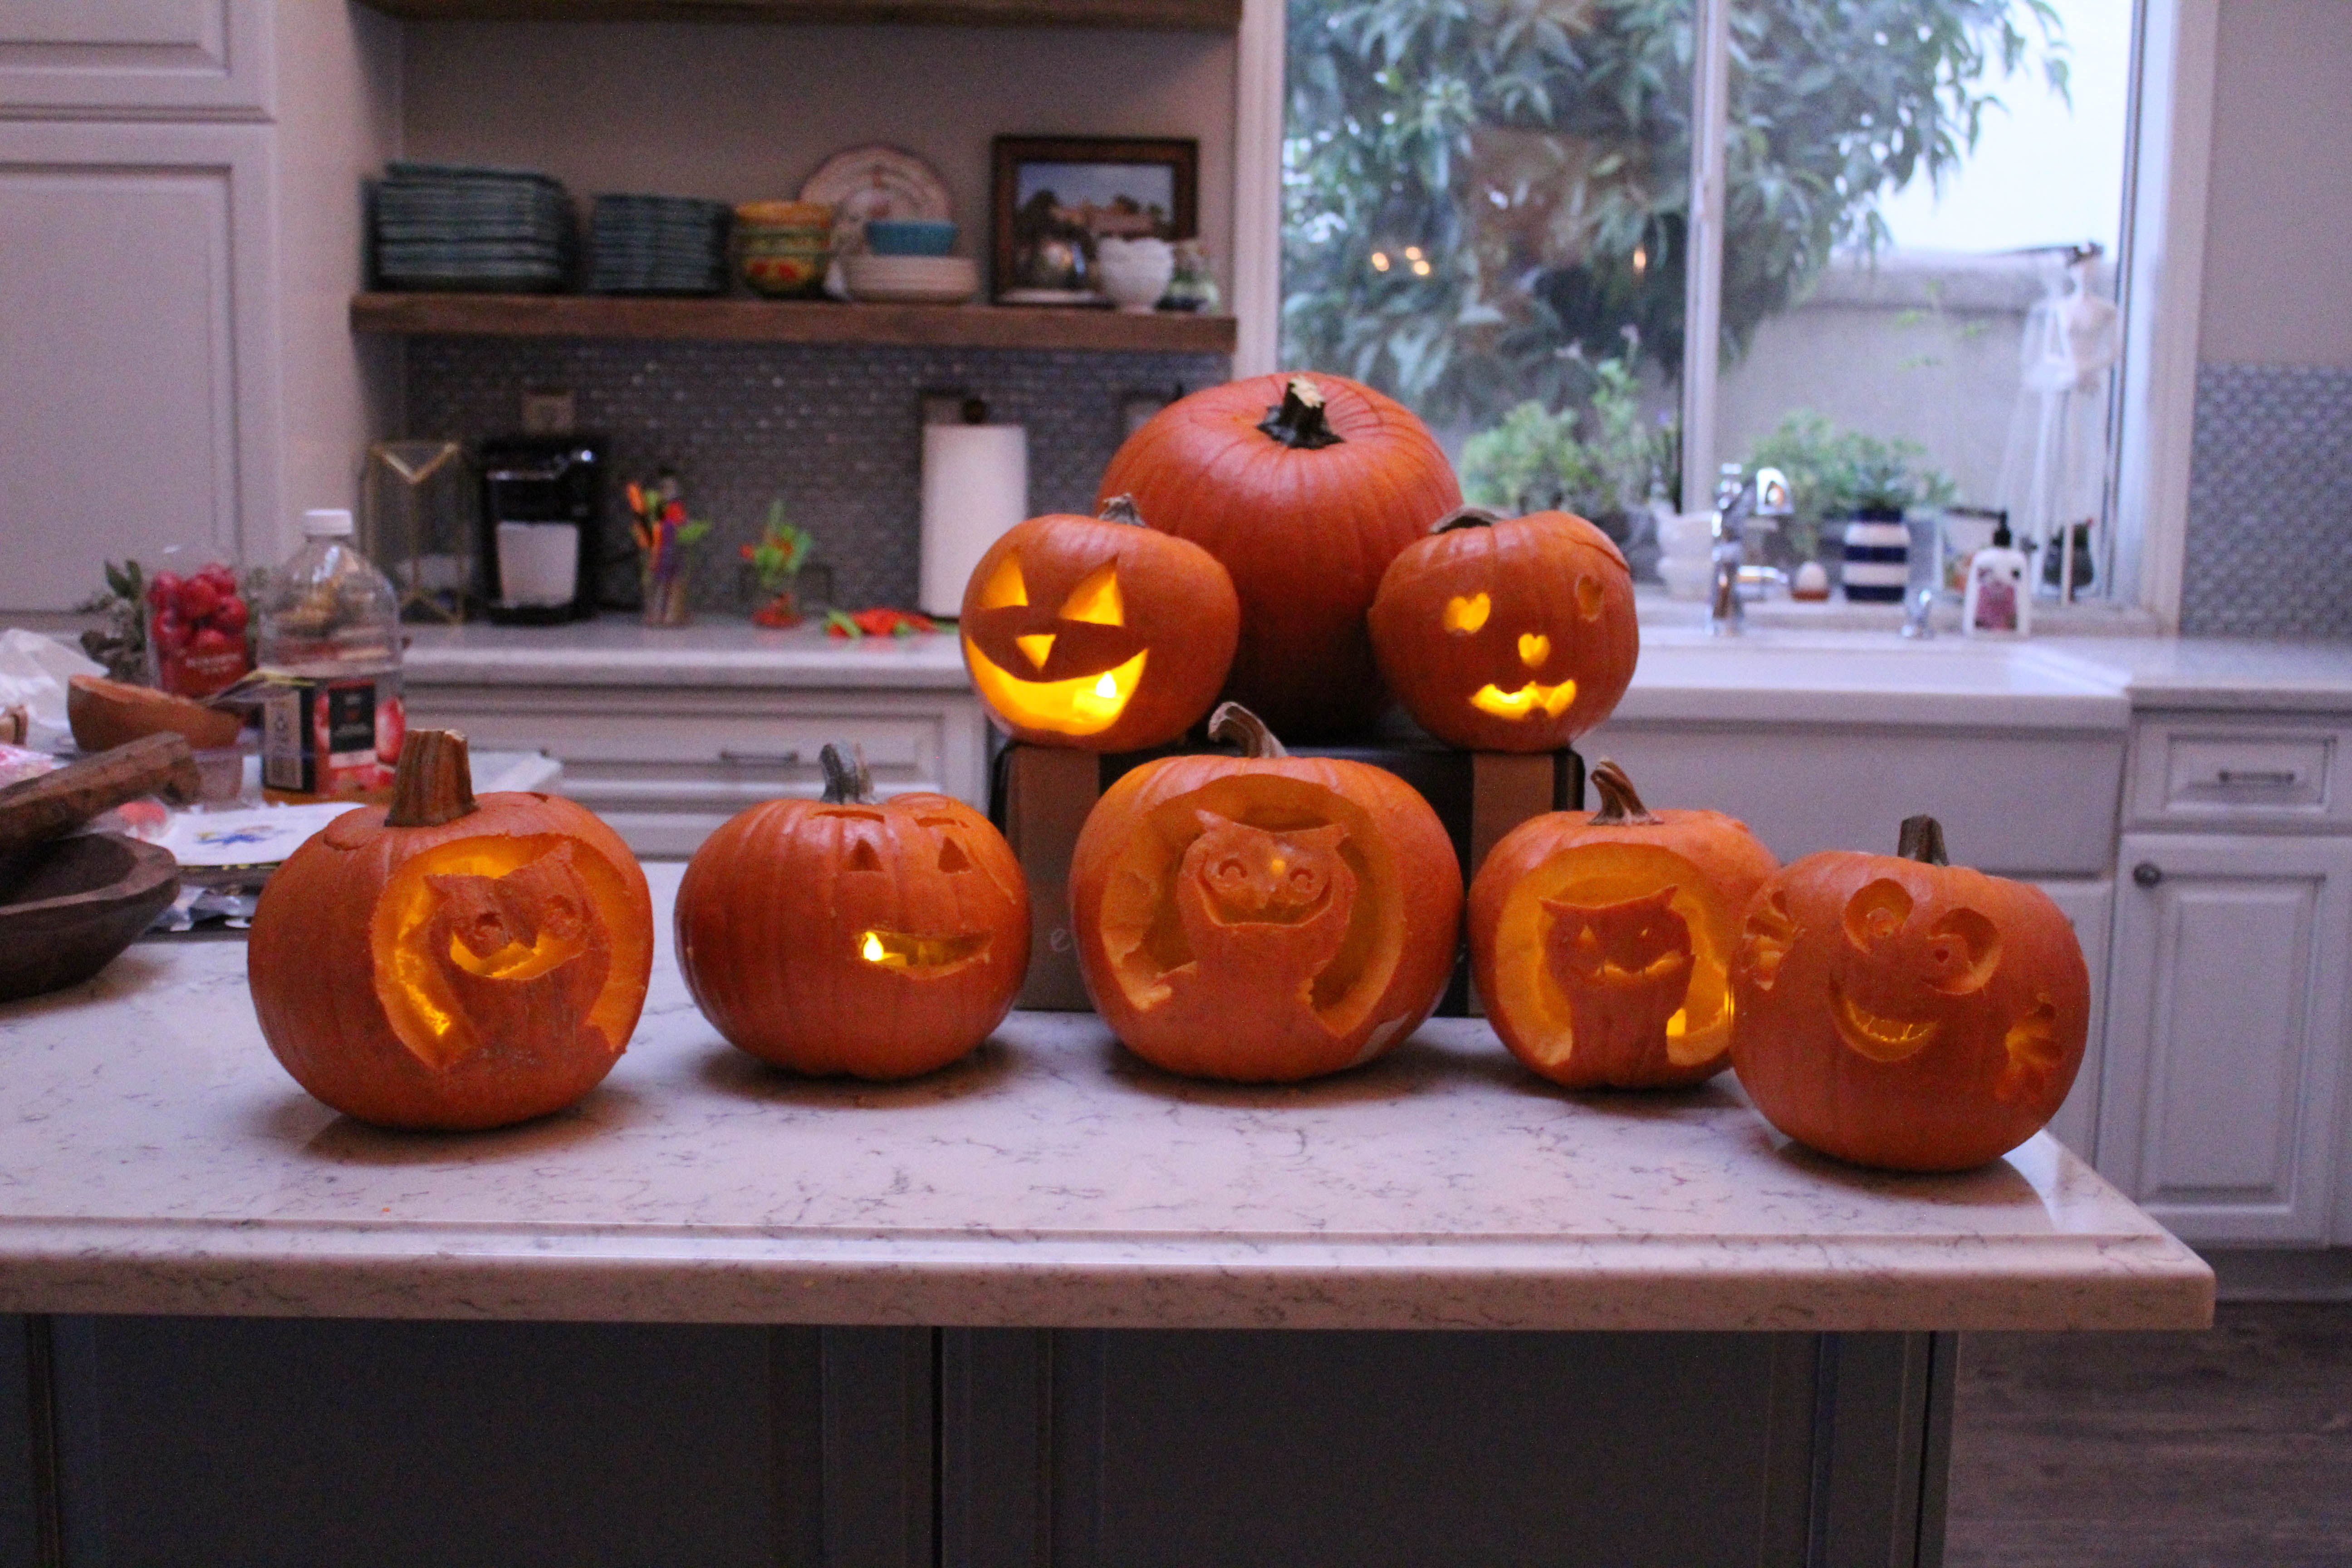 pumpkin-carving-party-costumes-kids-halloween-54